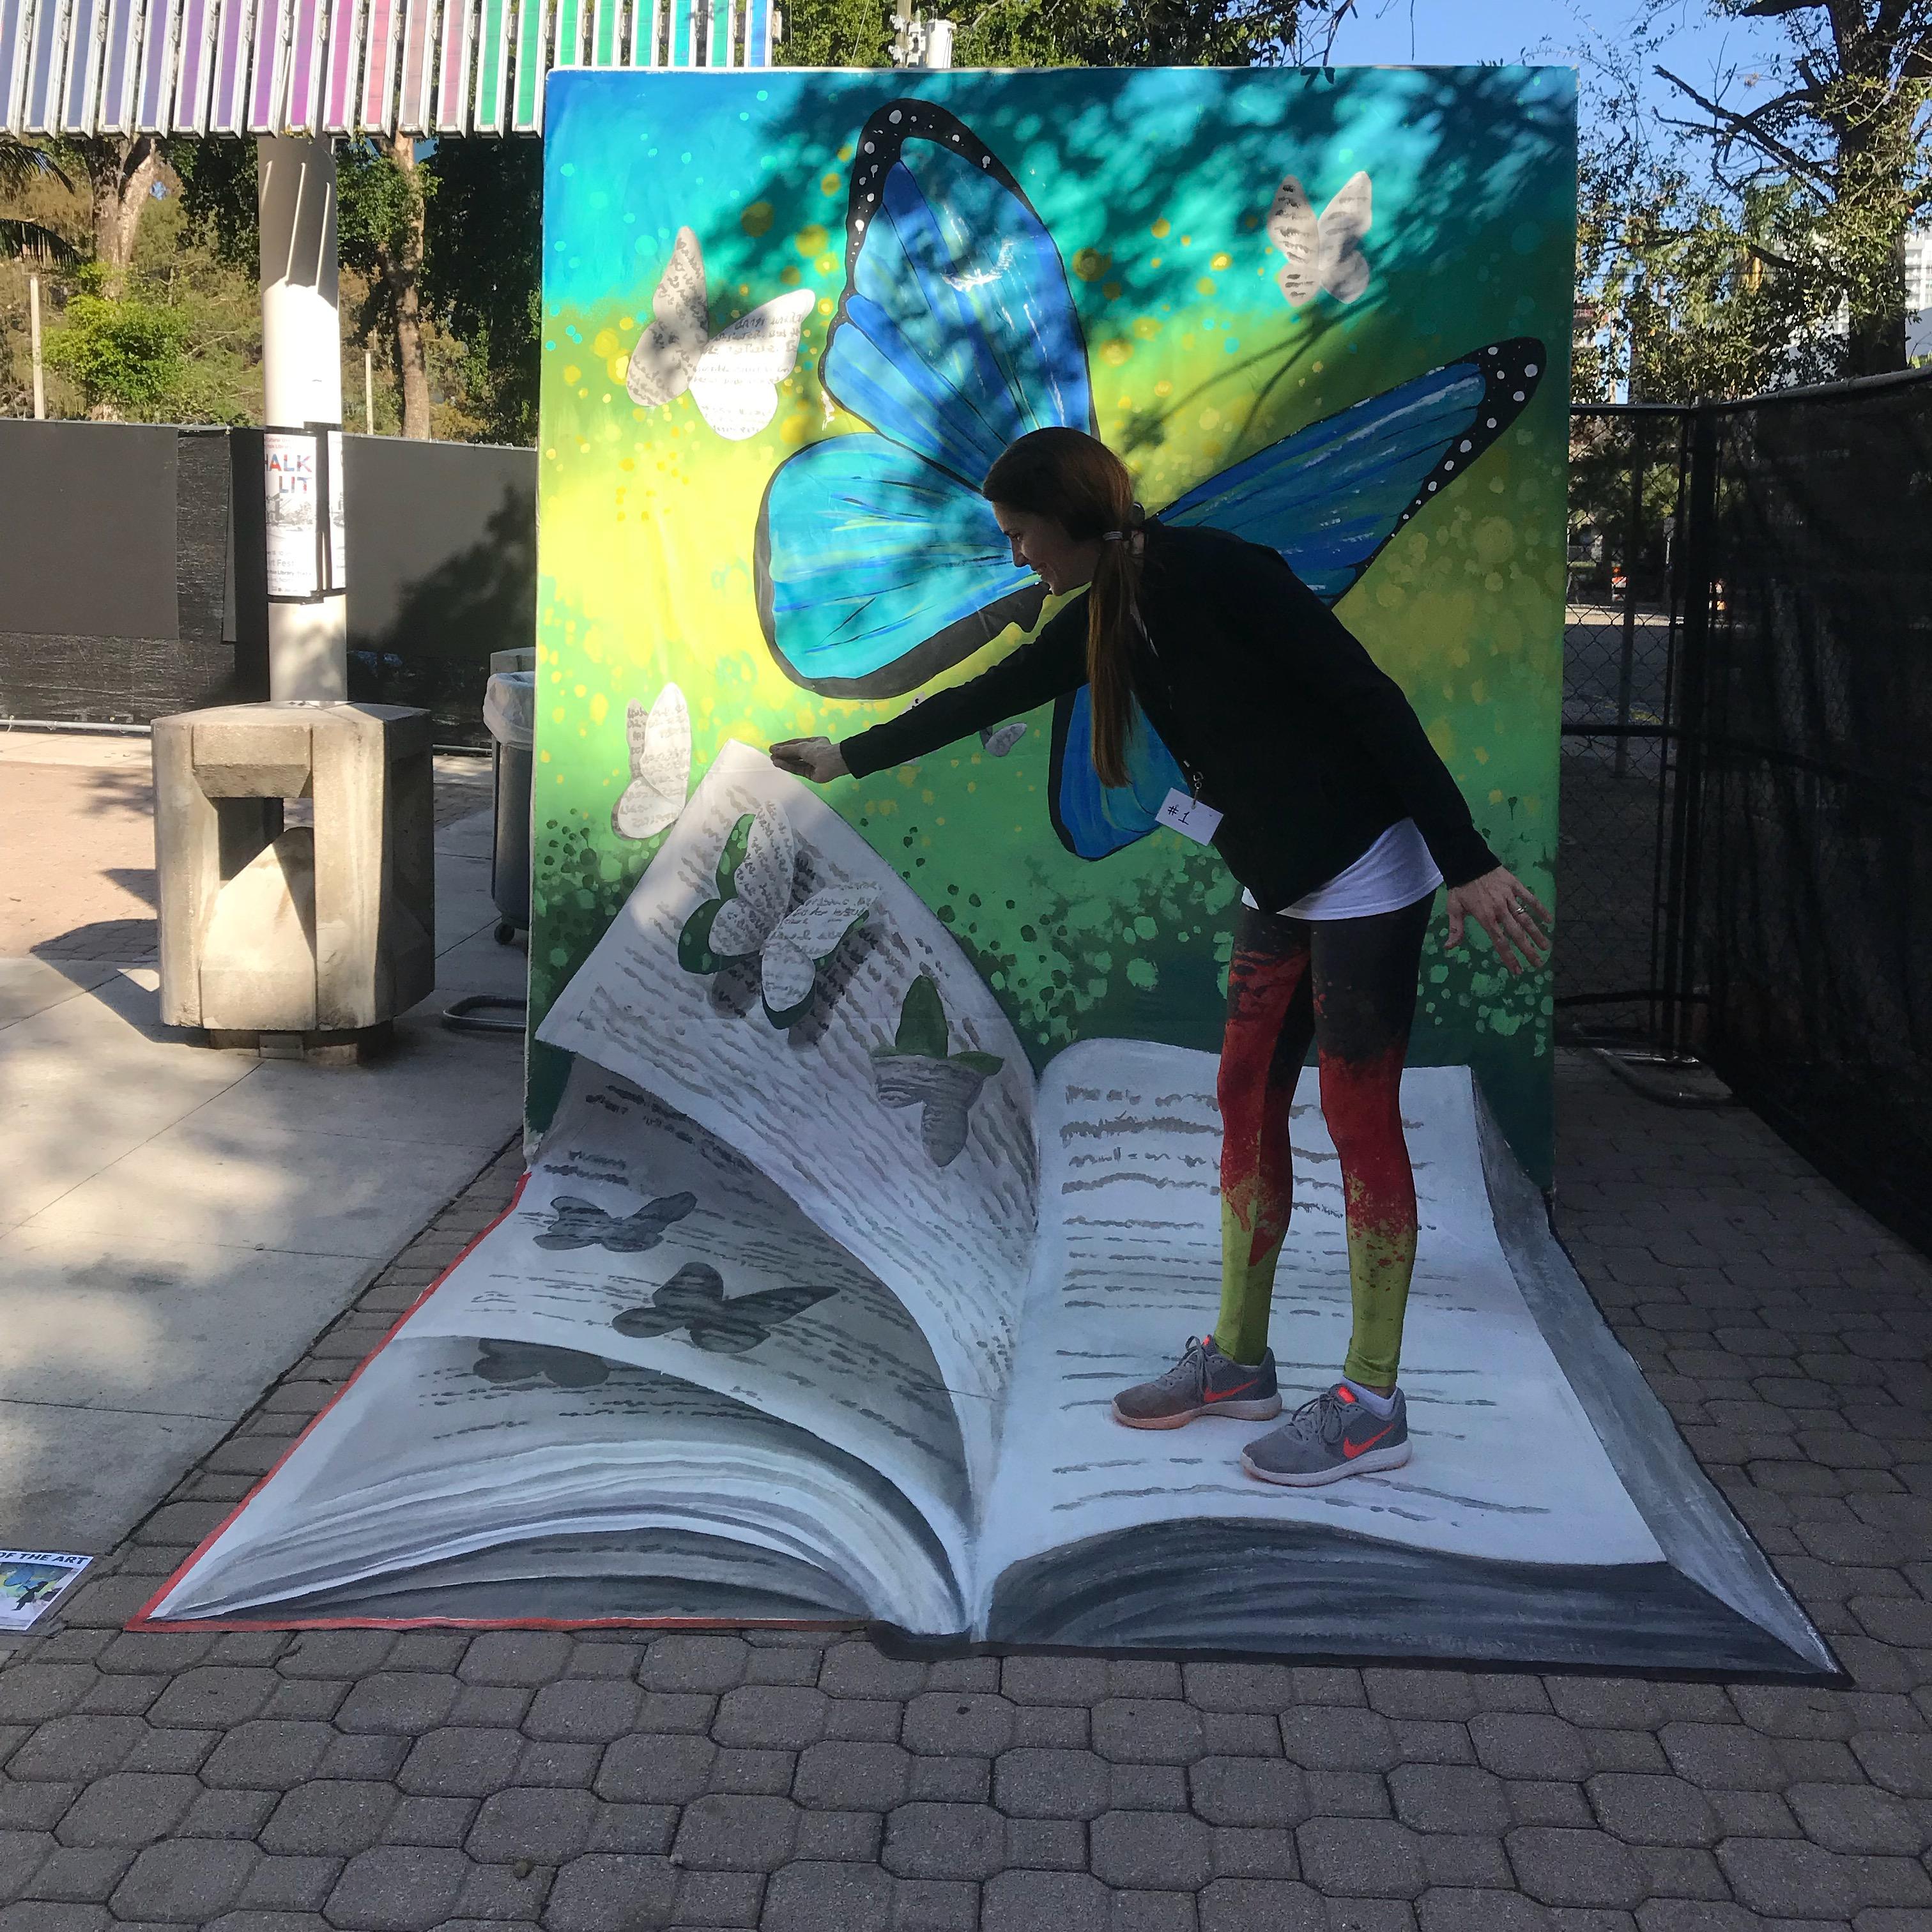 Chalk Lit 3D piece by Hector Diaz & Nate Baranowski